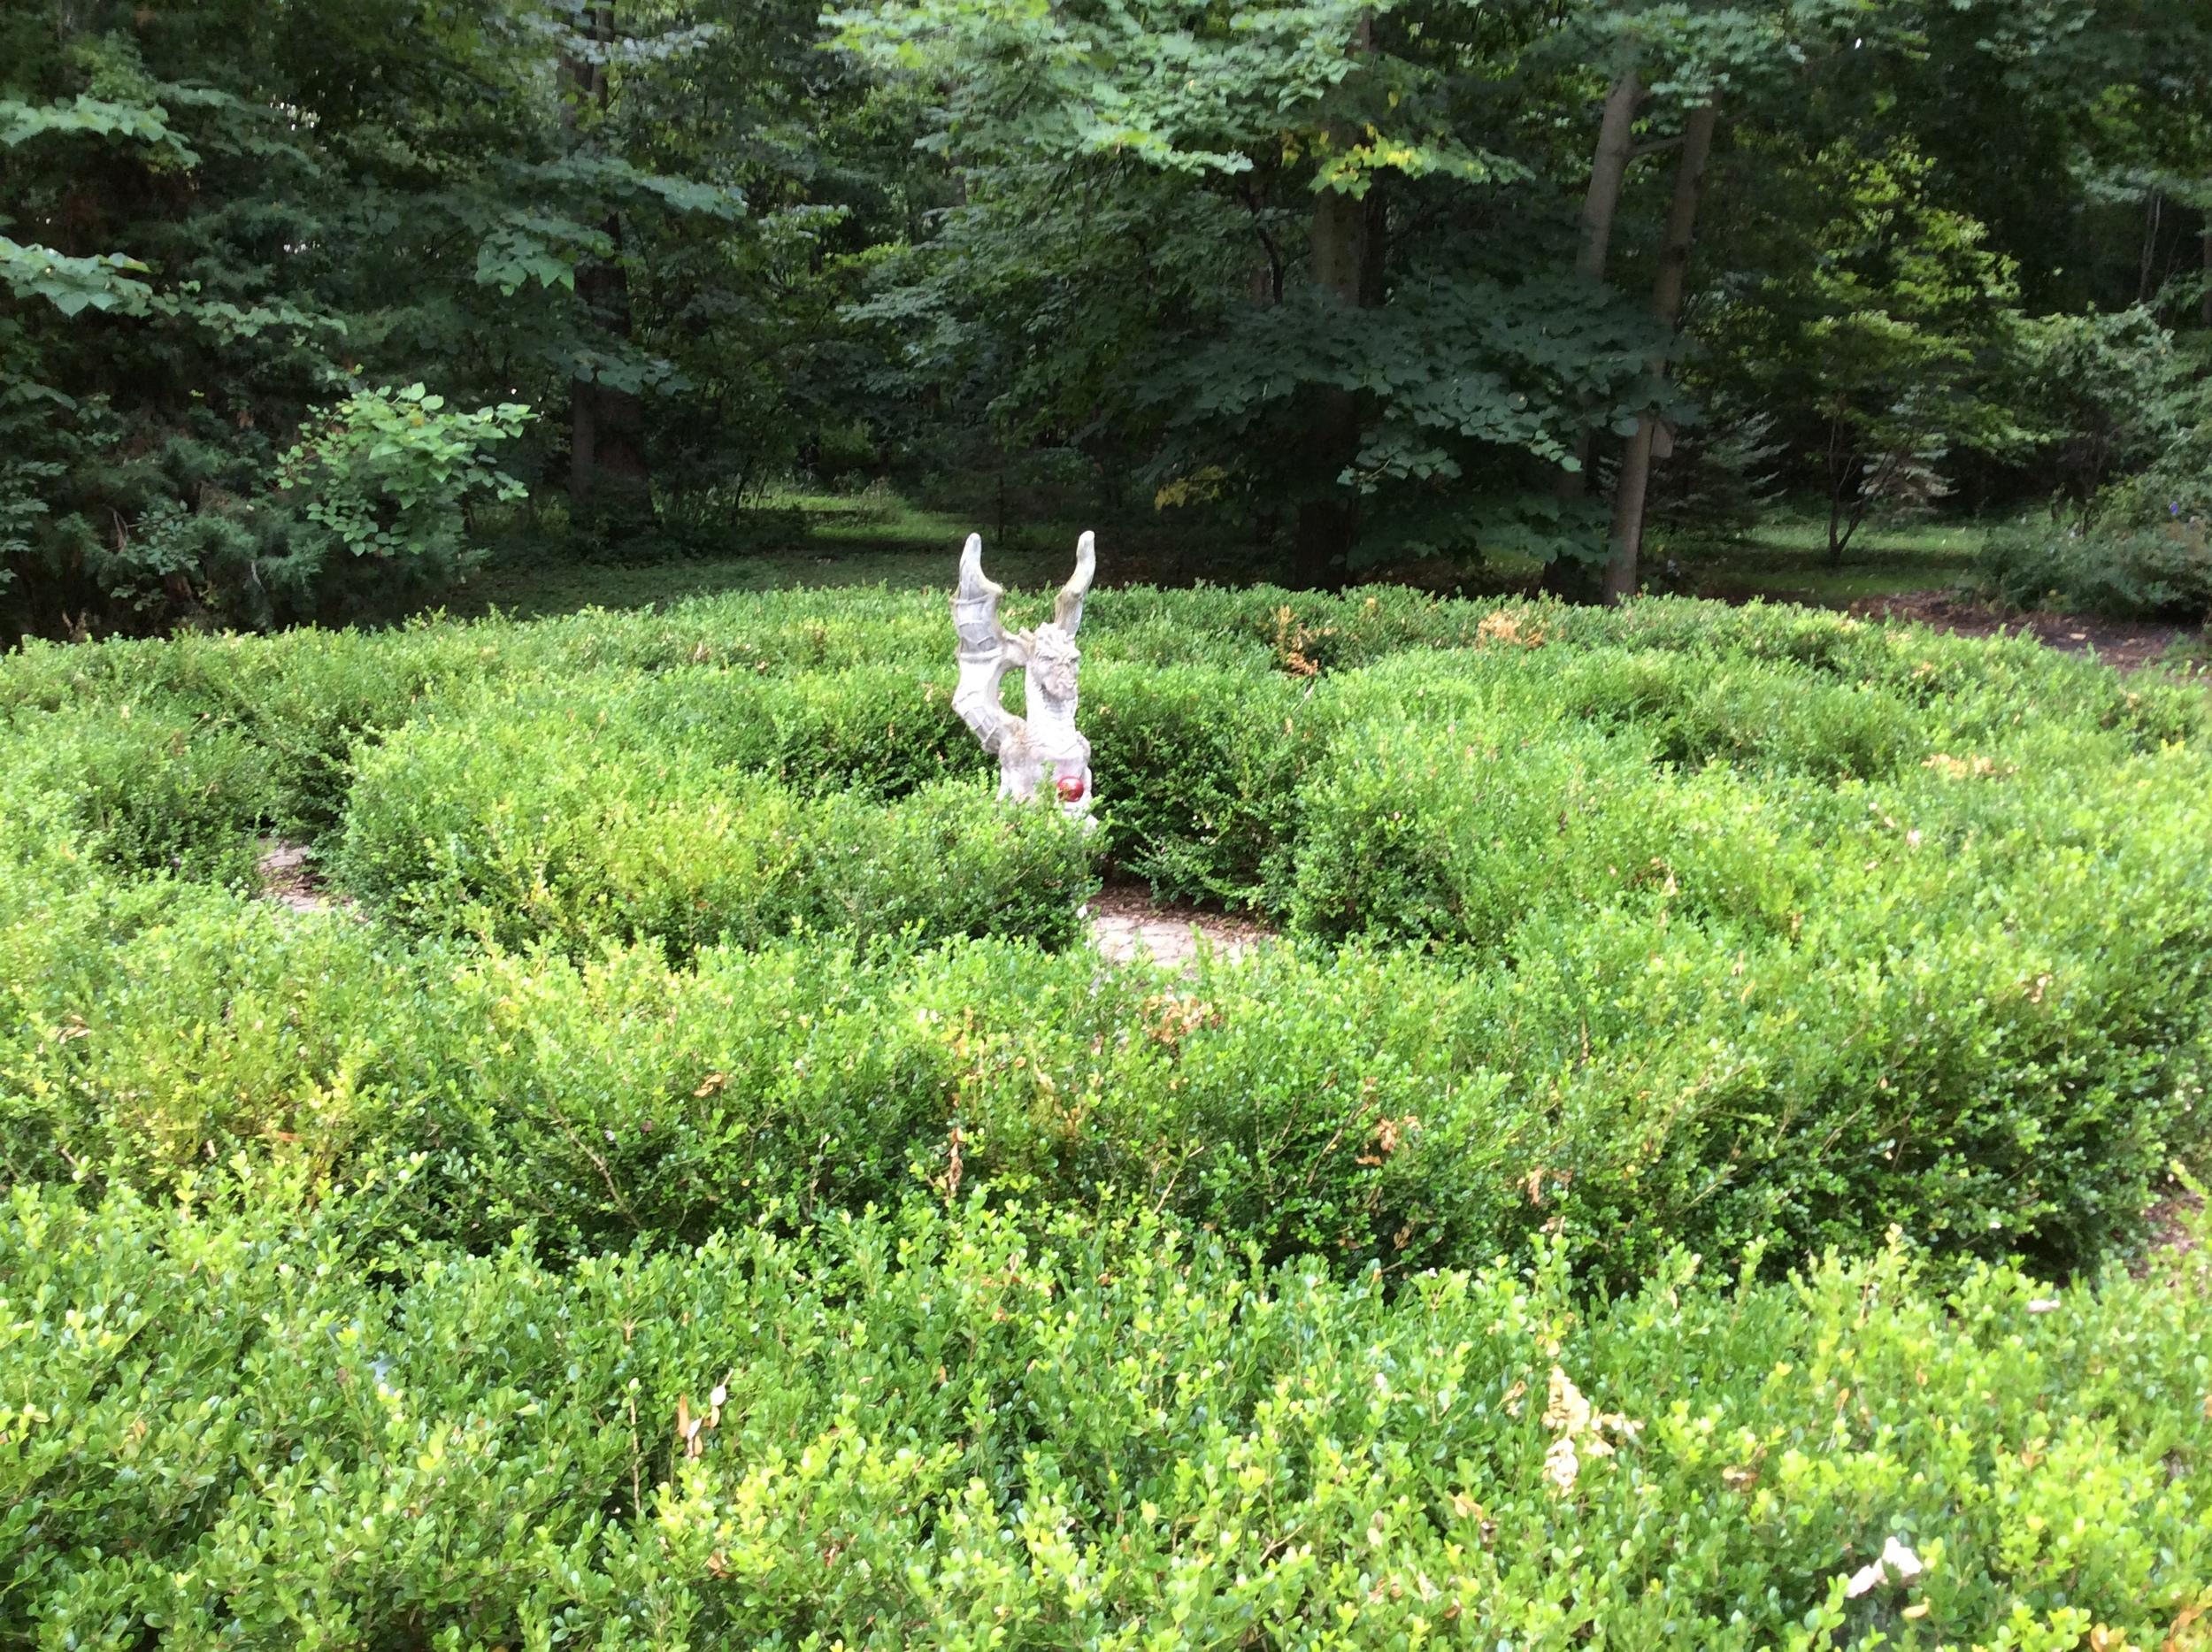 A maze in the backyard